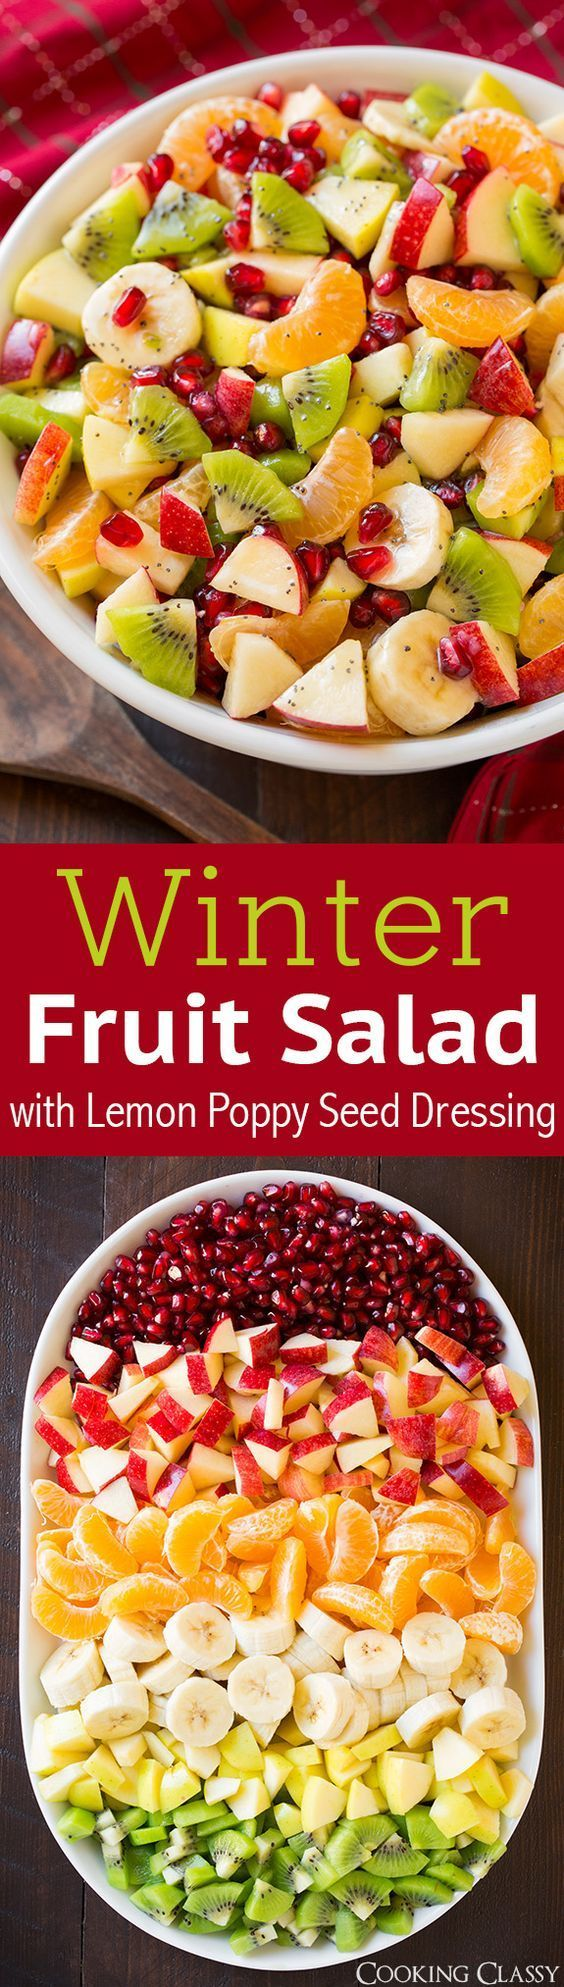 Best 25 Fruit Salad Ideas On Pinterest Kiwi Fruit Salad